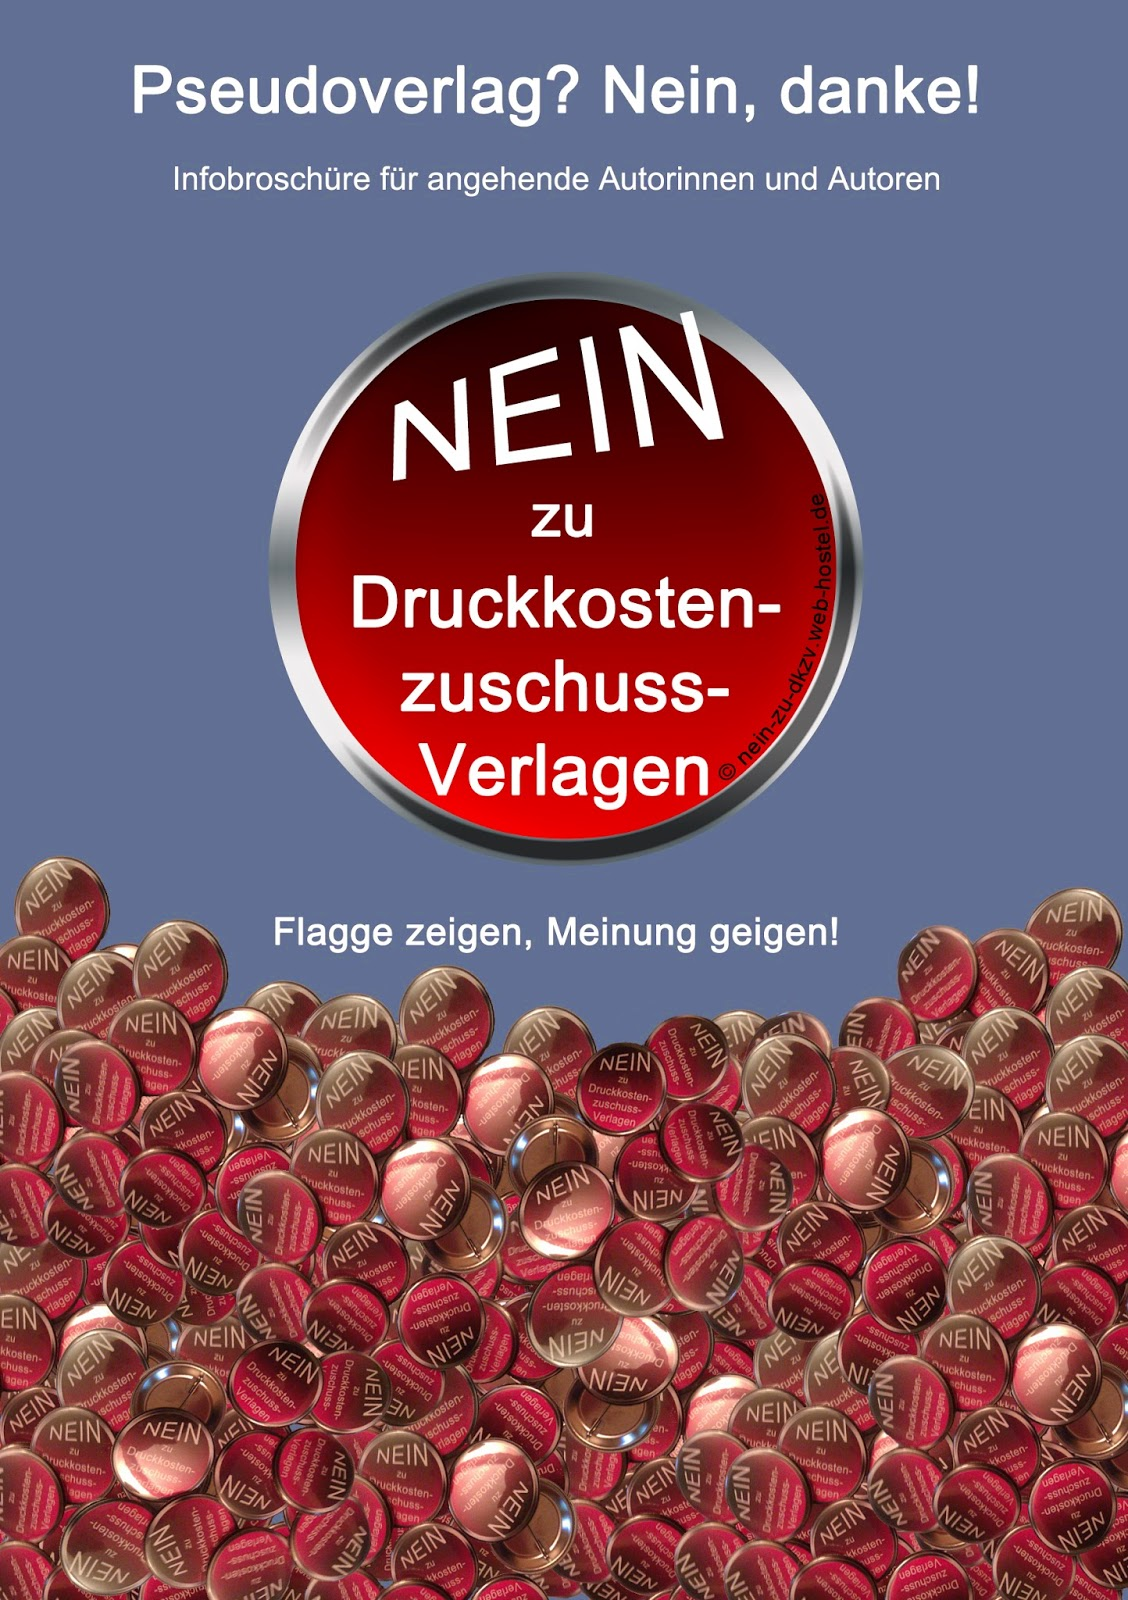 http://www.amazon.de/Pseudoverlag-Nein-danke-Sandra-Schmidt-ebook/dp/B00P6DADC6/ref=cm_cr_pr_product_top